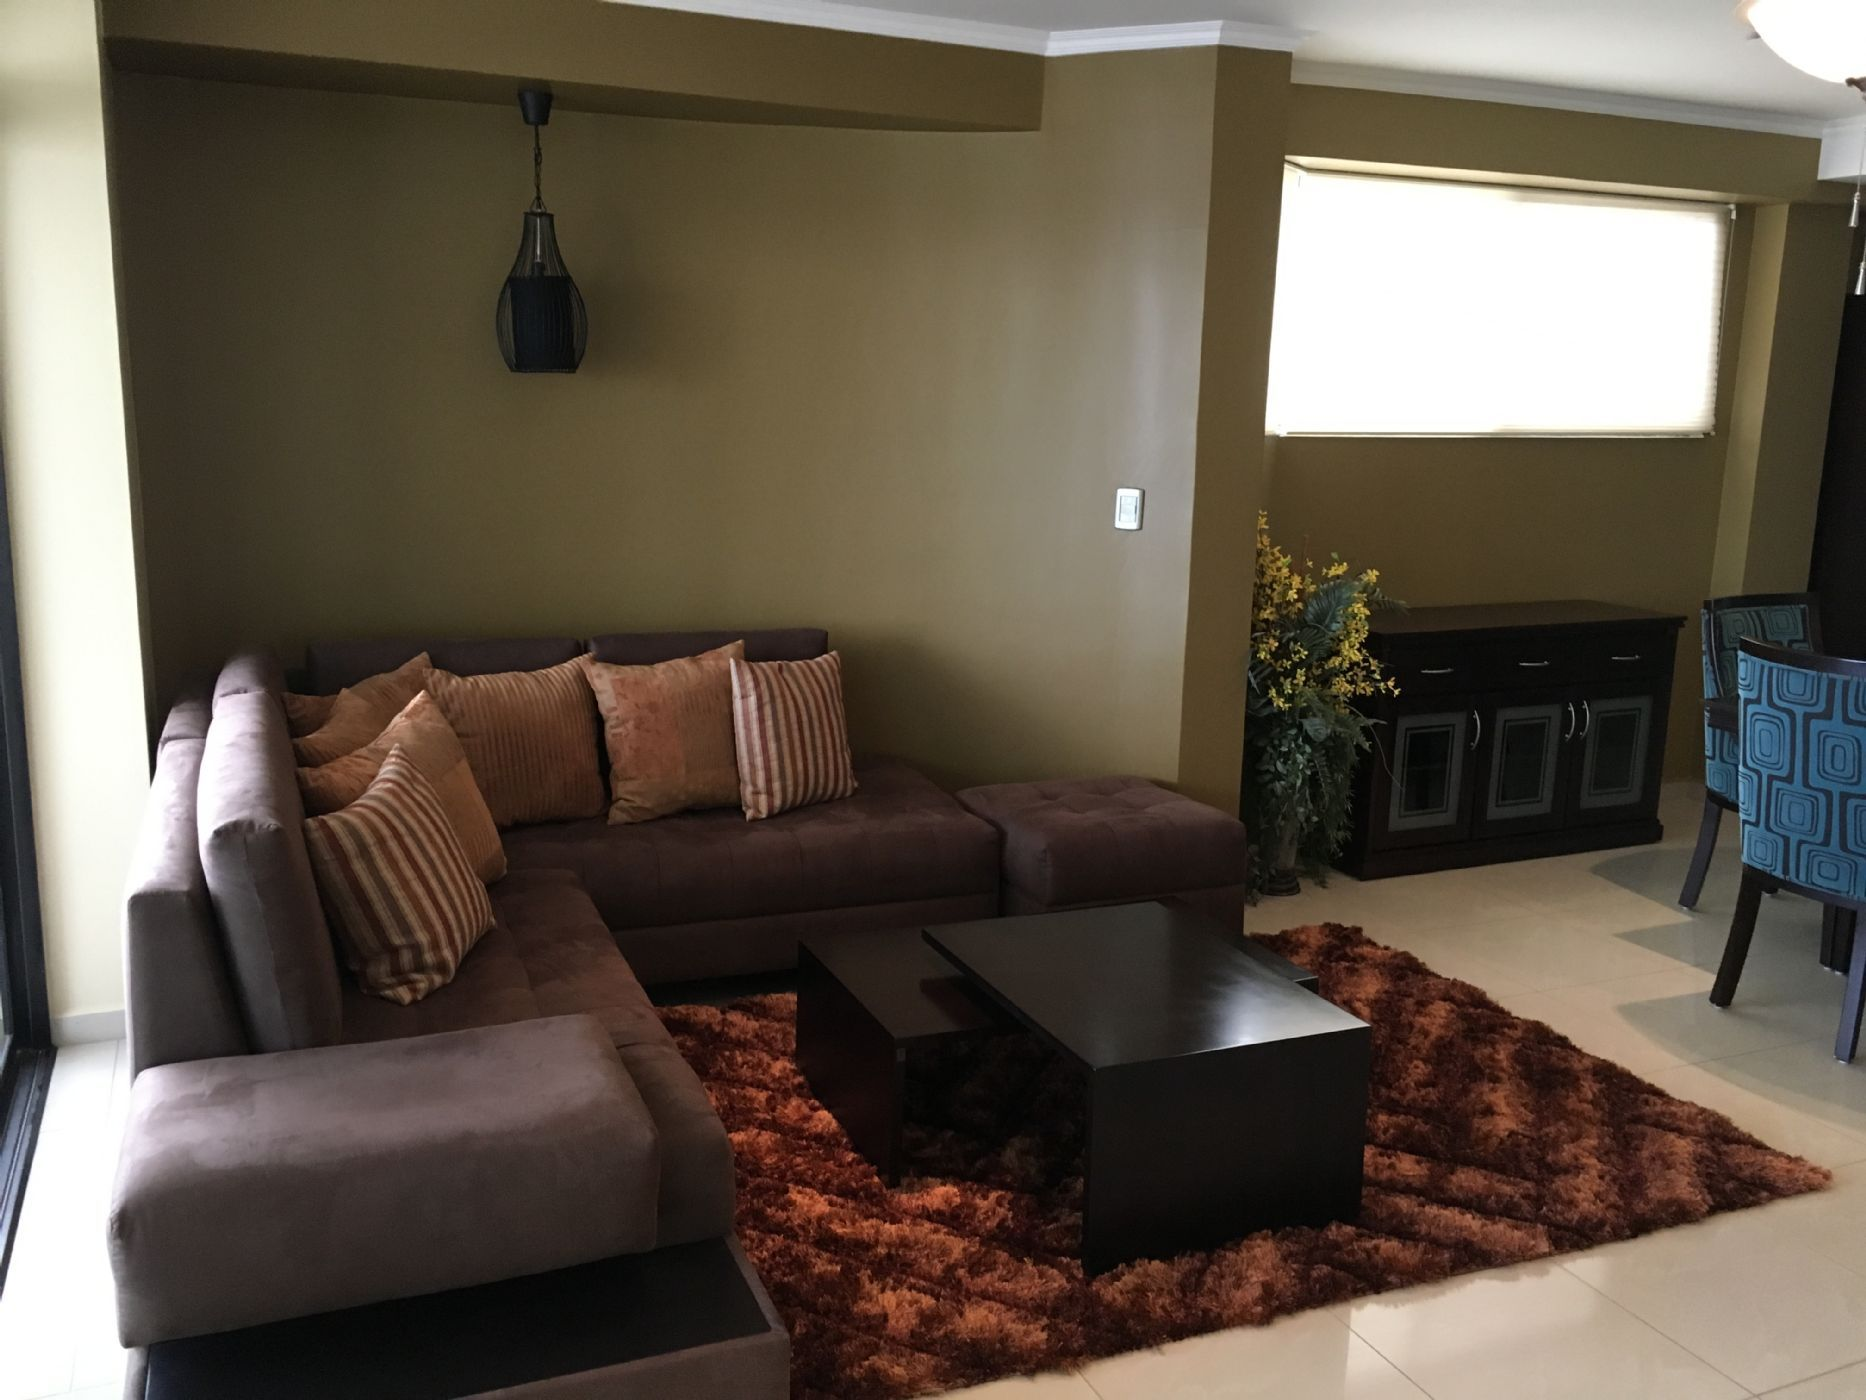 Salinas-Ecuador-property-495688-11.JPG